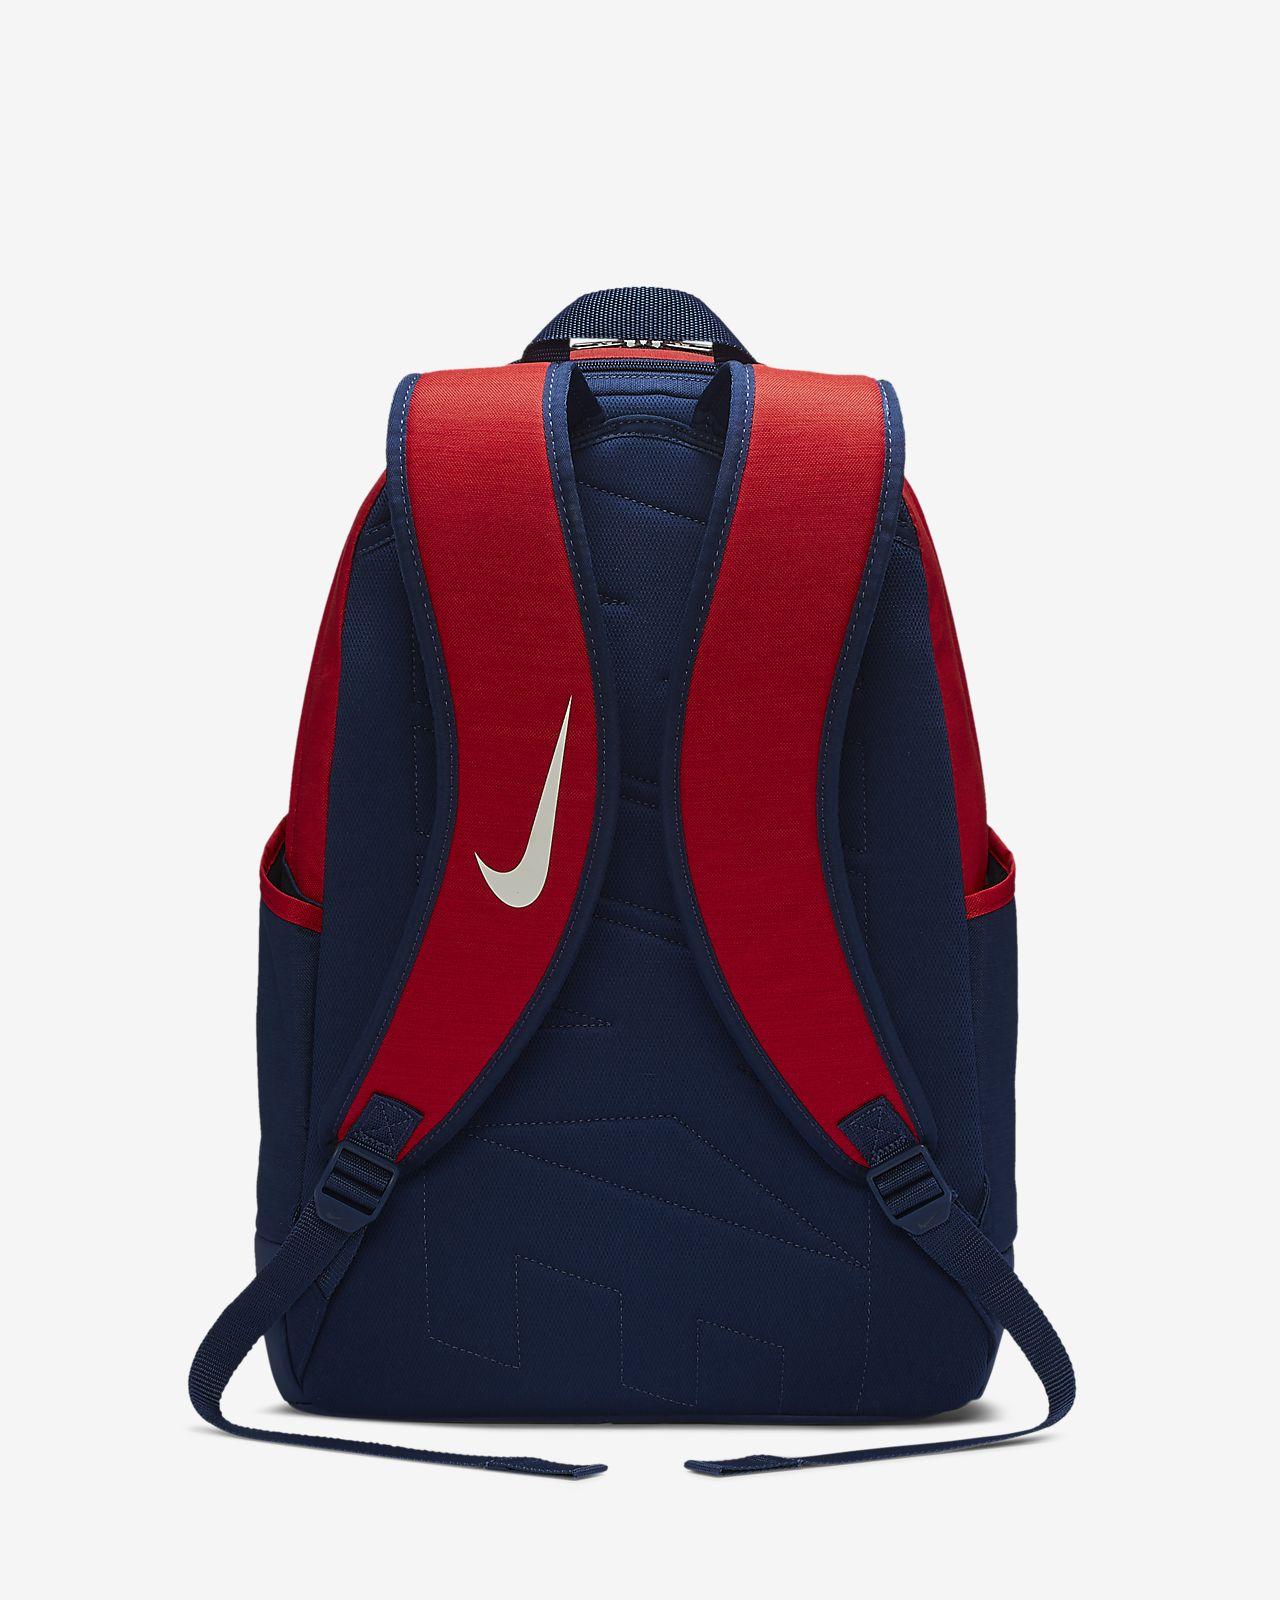 official photos 291be caec9 ... Nike Brasilia Training Backpack (Extra Large)